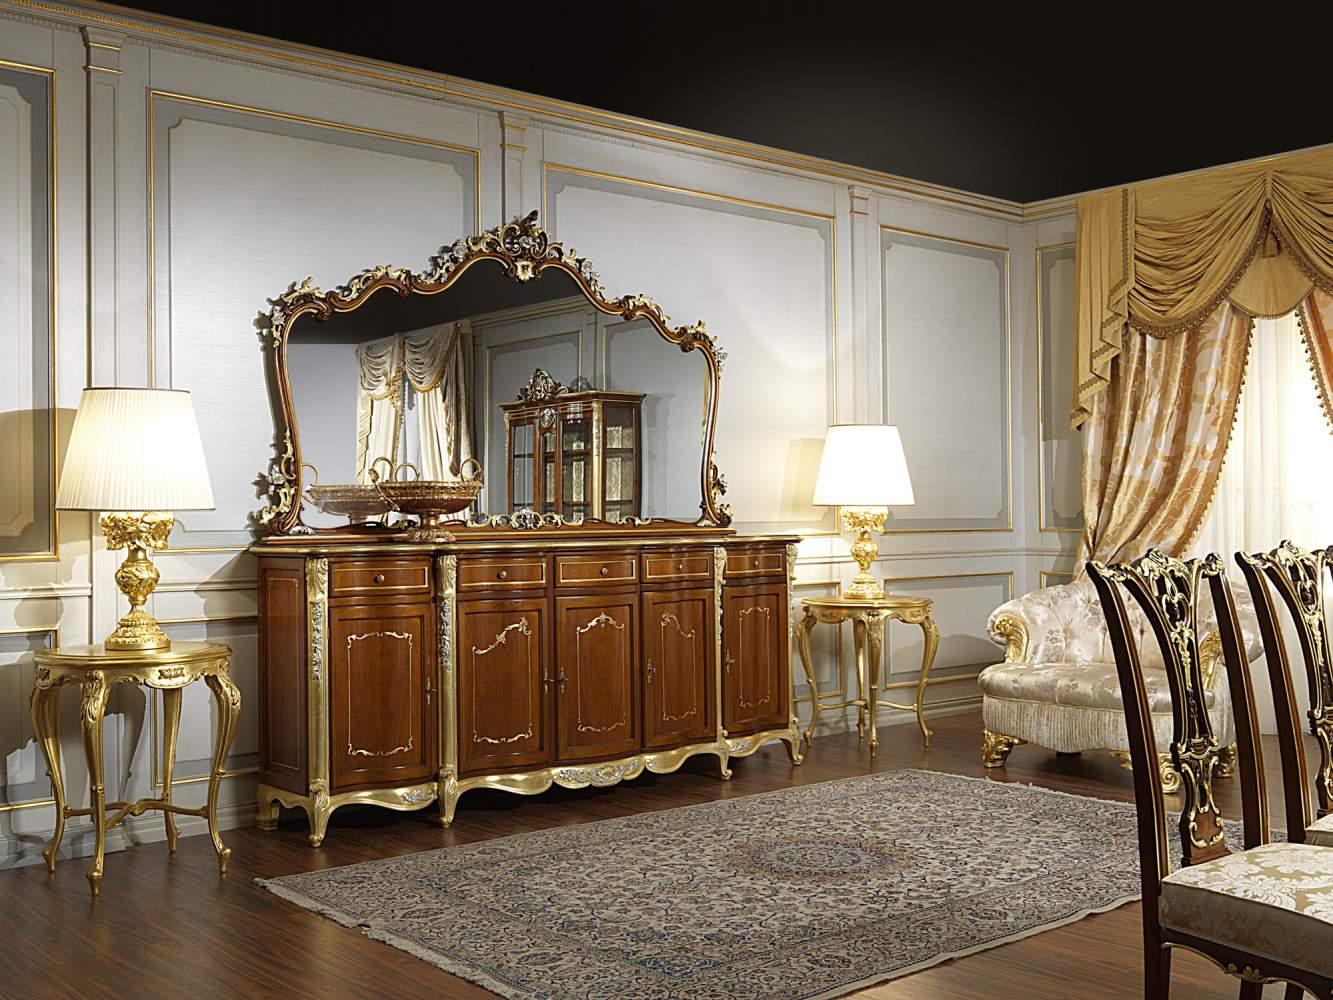 Credenza Classica Sala Da Pranzo In Stile Luigi XV Vimercati Meda #644327 1333 1000 Sala Da Pranzo Classica